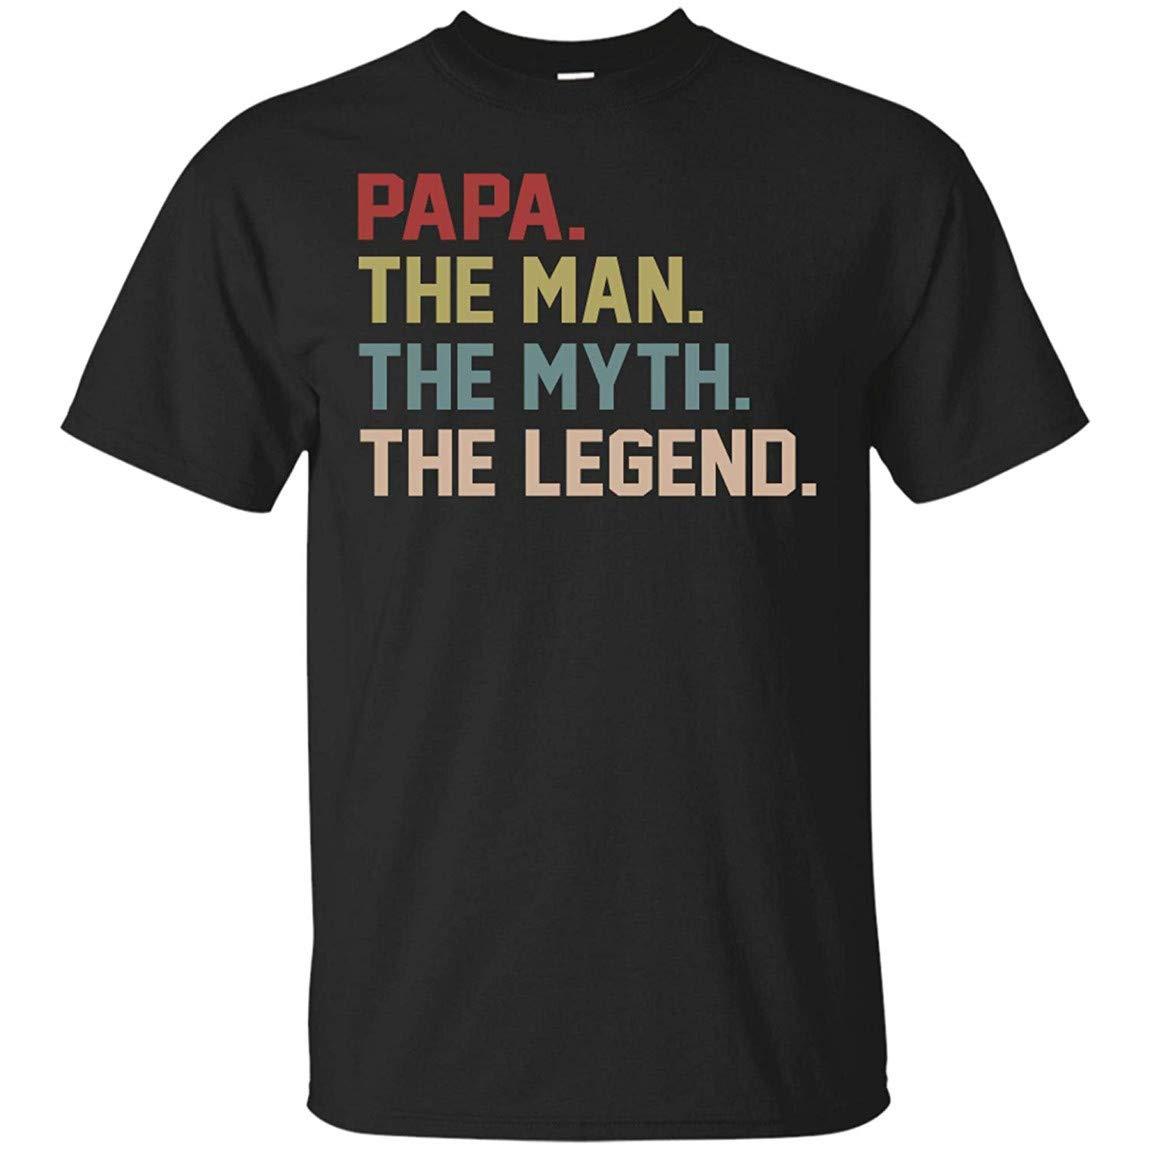 The Man The Myth The Legend Shirt For S Papa T-shirt Black